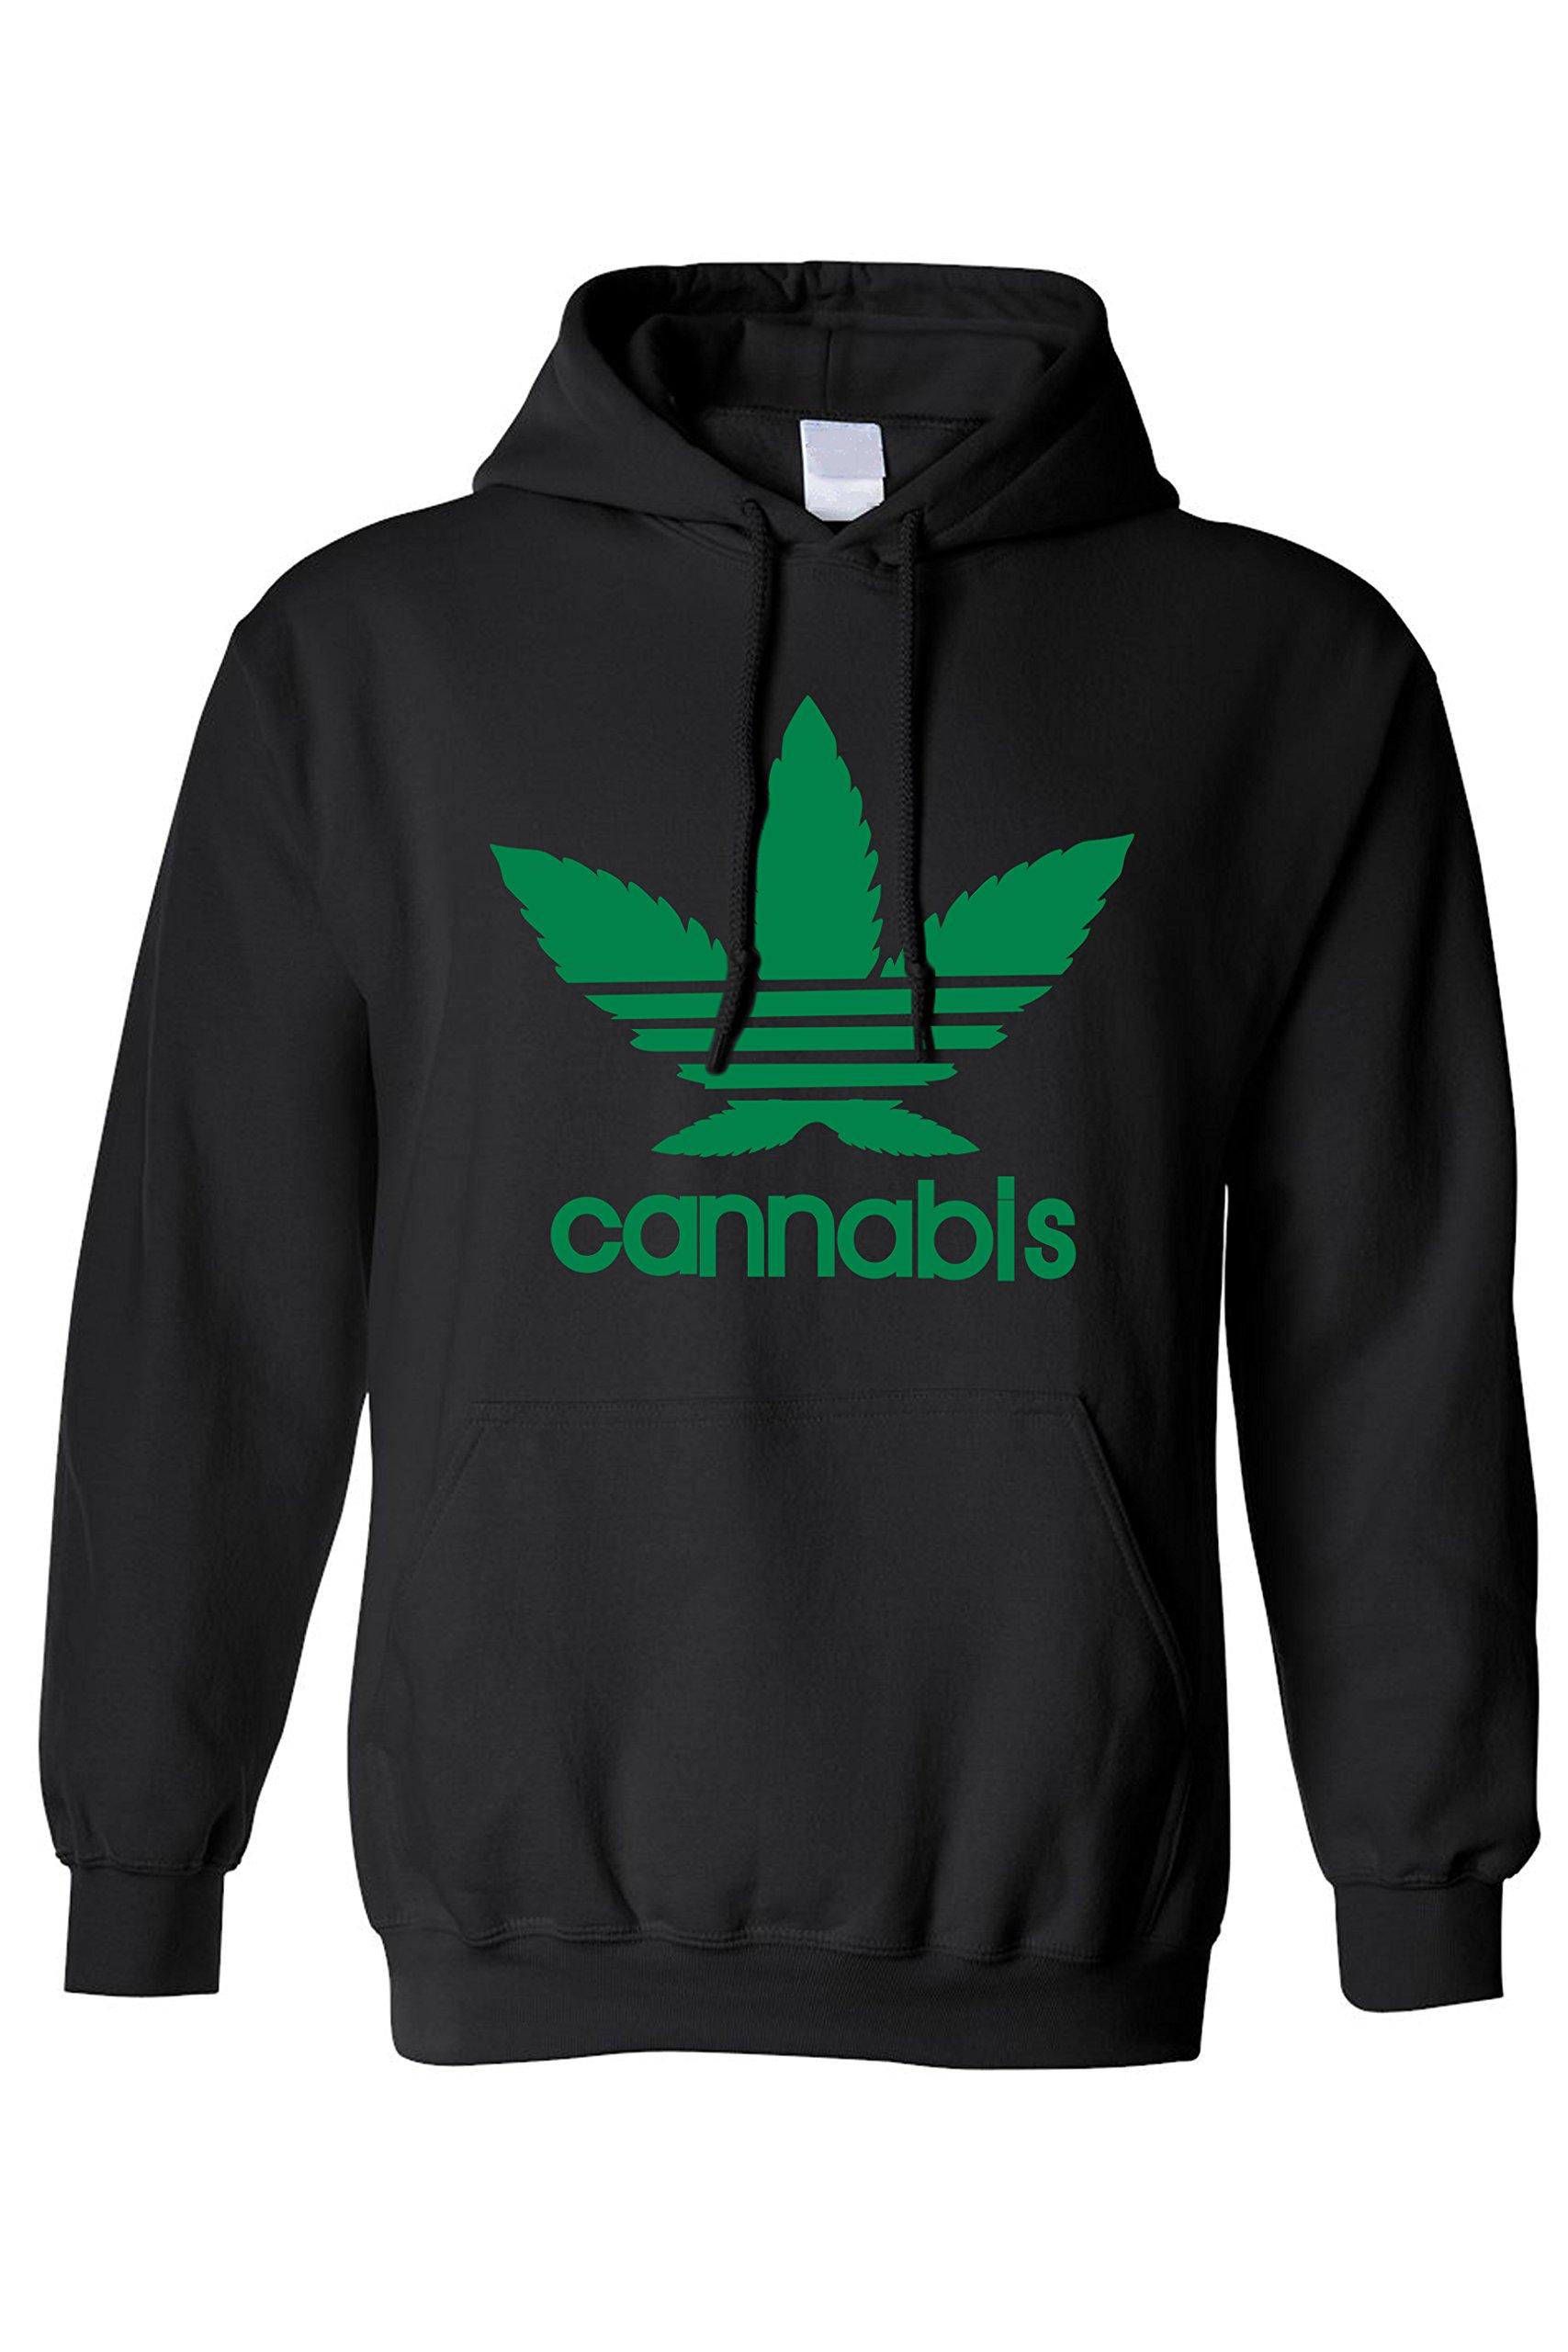 SHORE TRENDZ Men's/Unisex Pullover Hoodie Cannabis